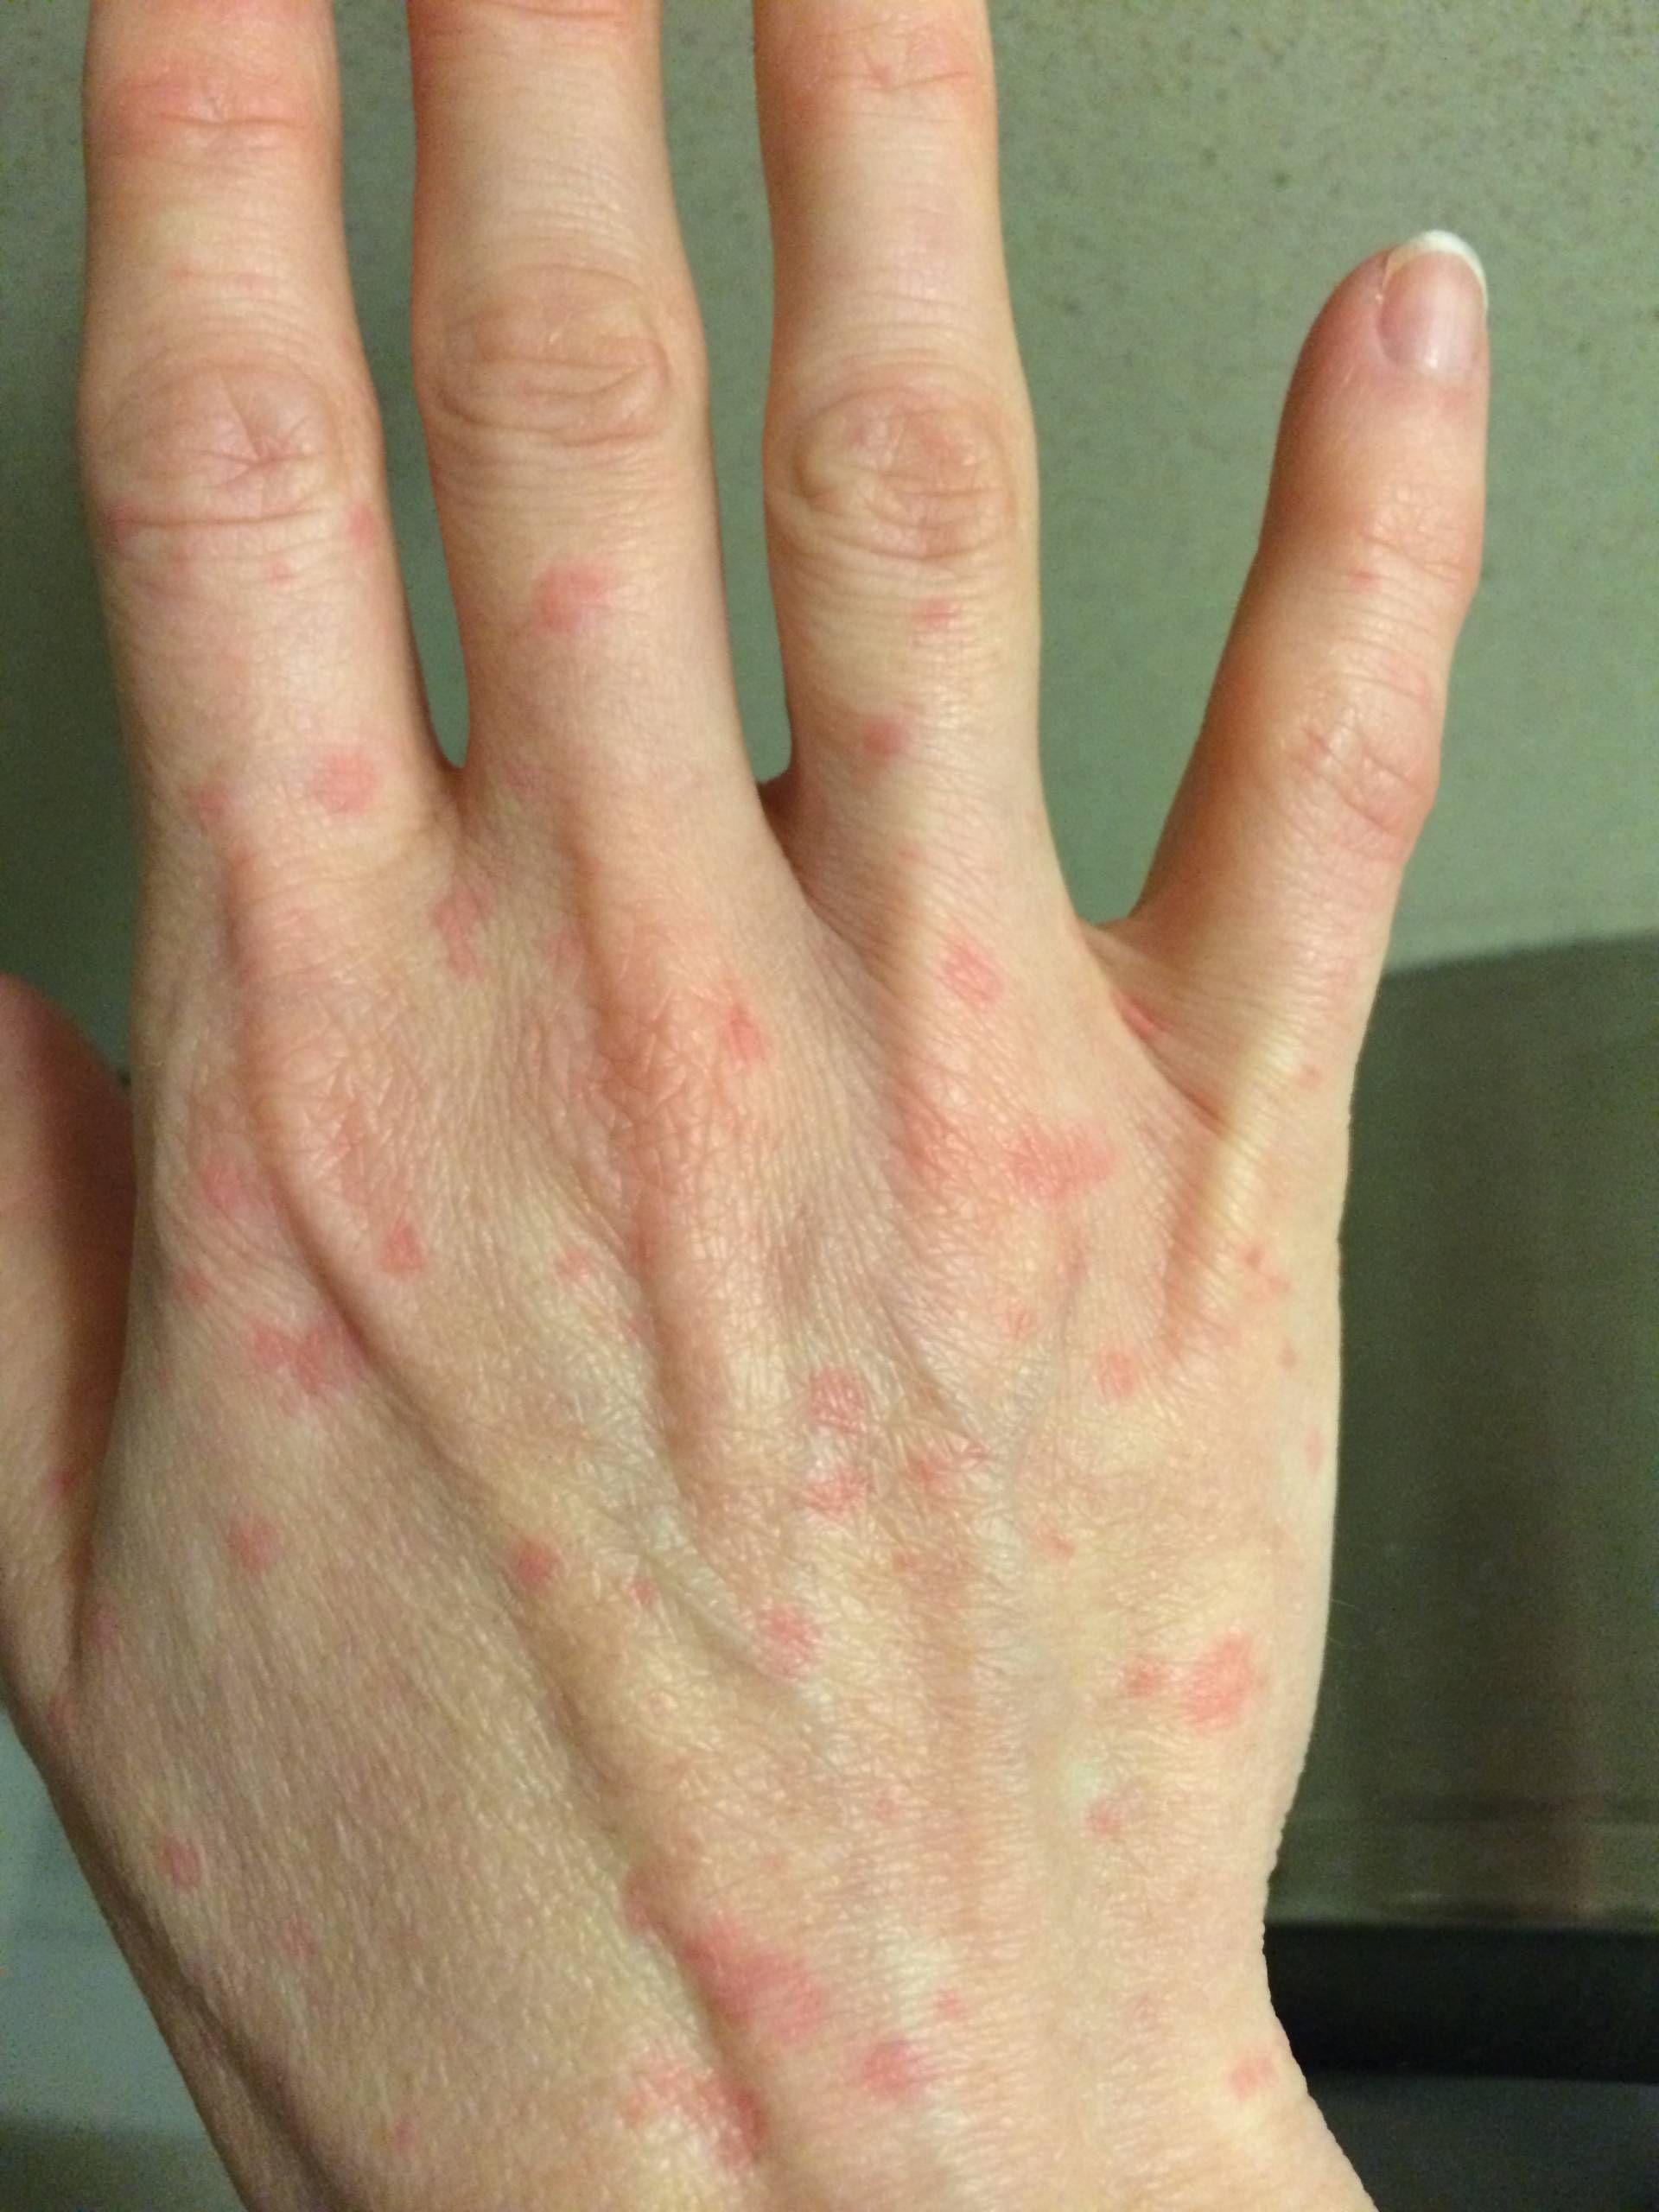 Idiopathic urticaria: causes, symptoms, diagnosis and treatment 16